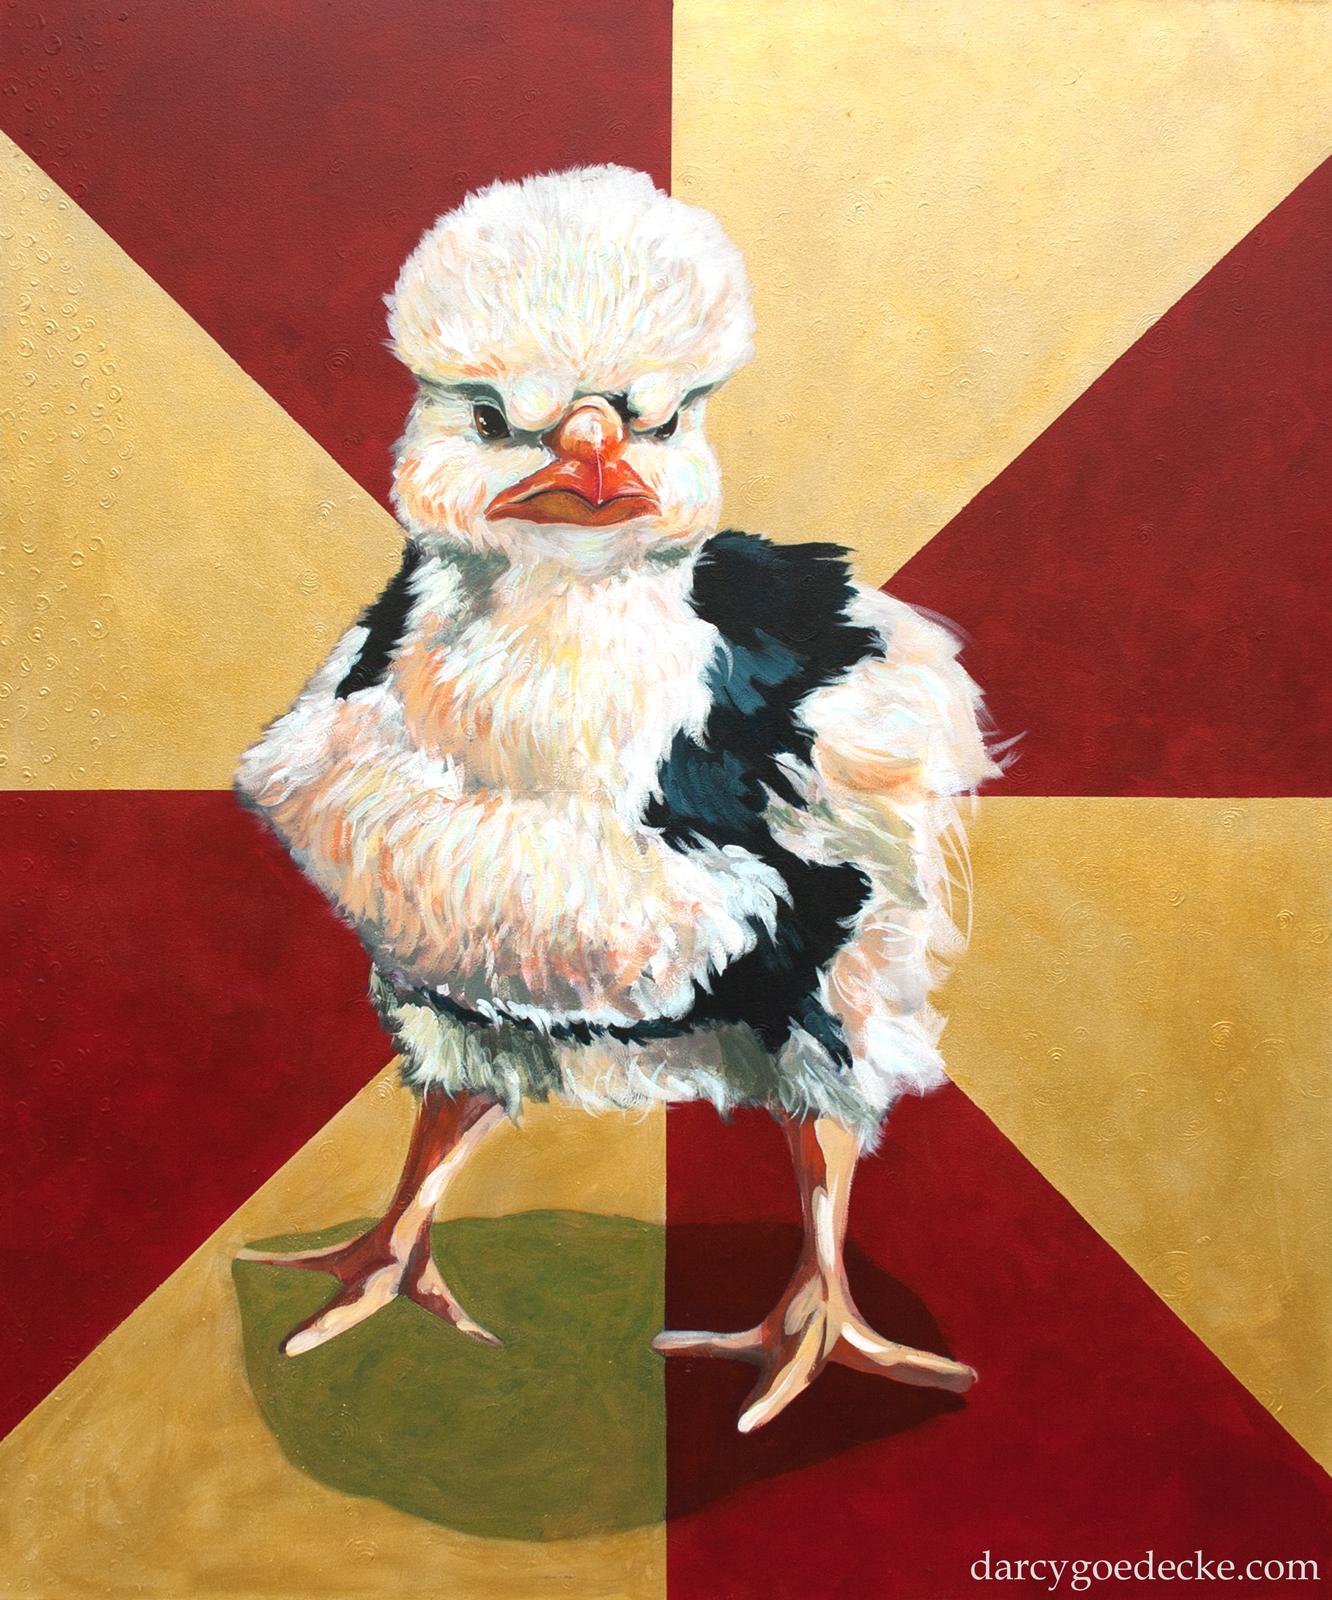 Badass Chick #2